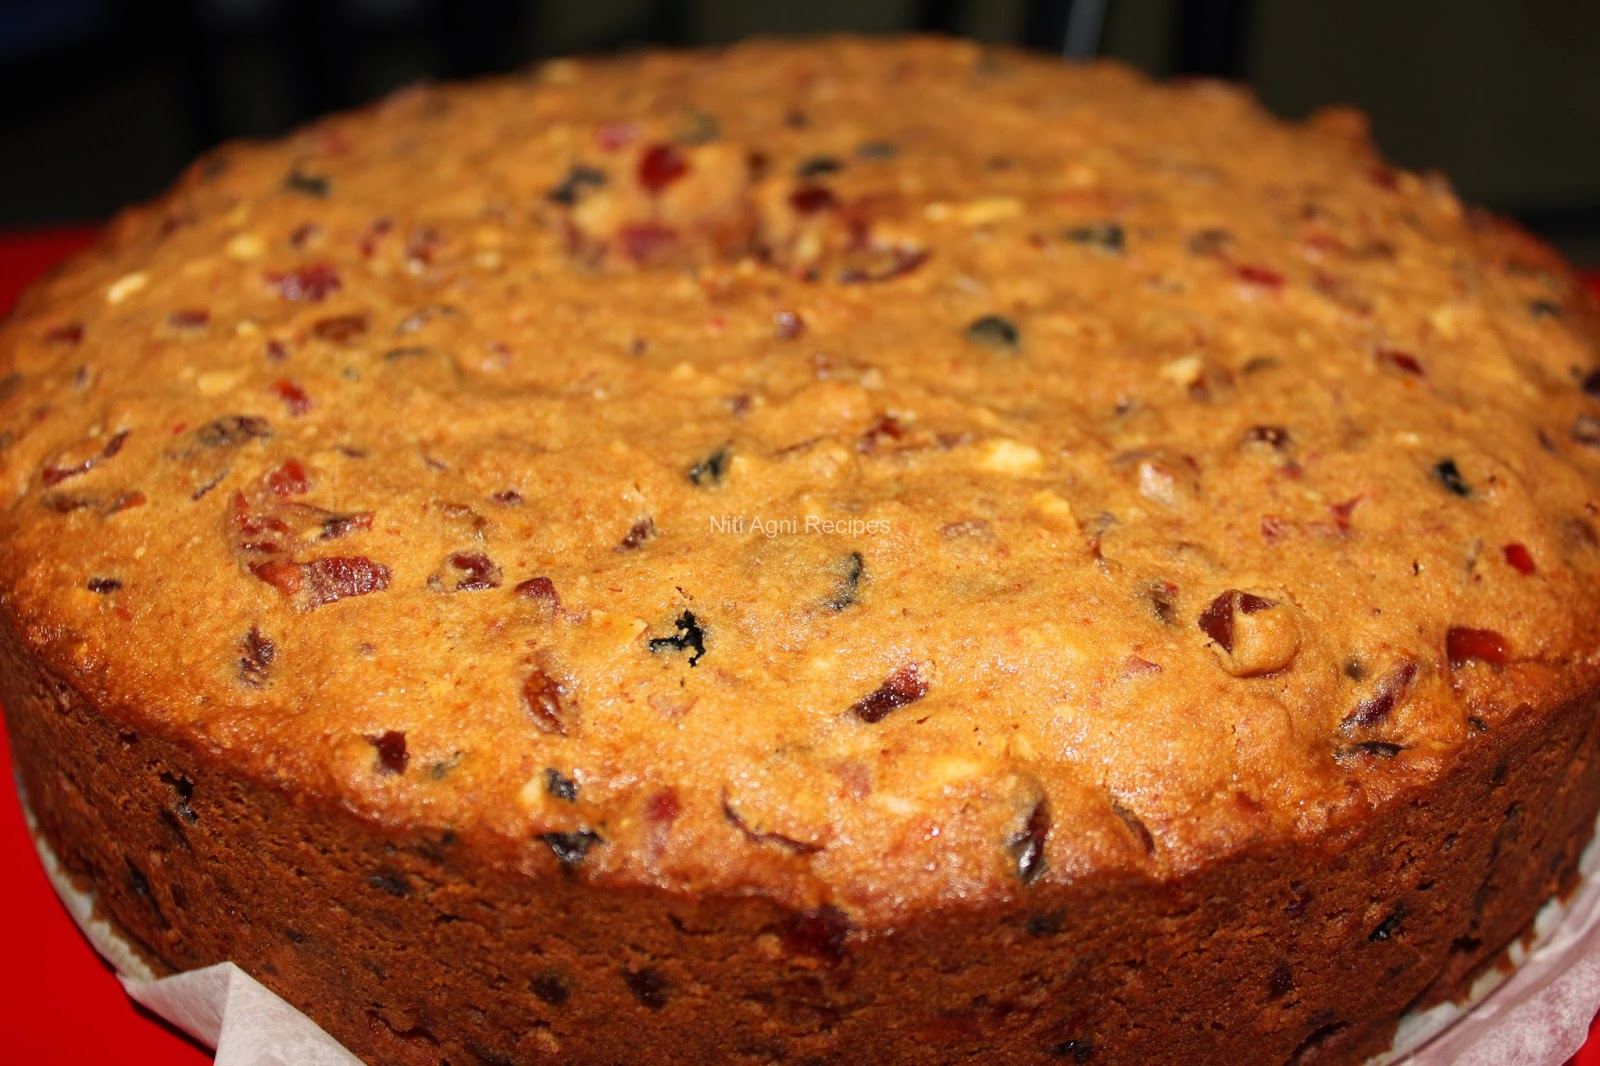 Rum Soaked Cake That Takes Weeks To Make